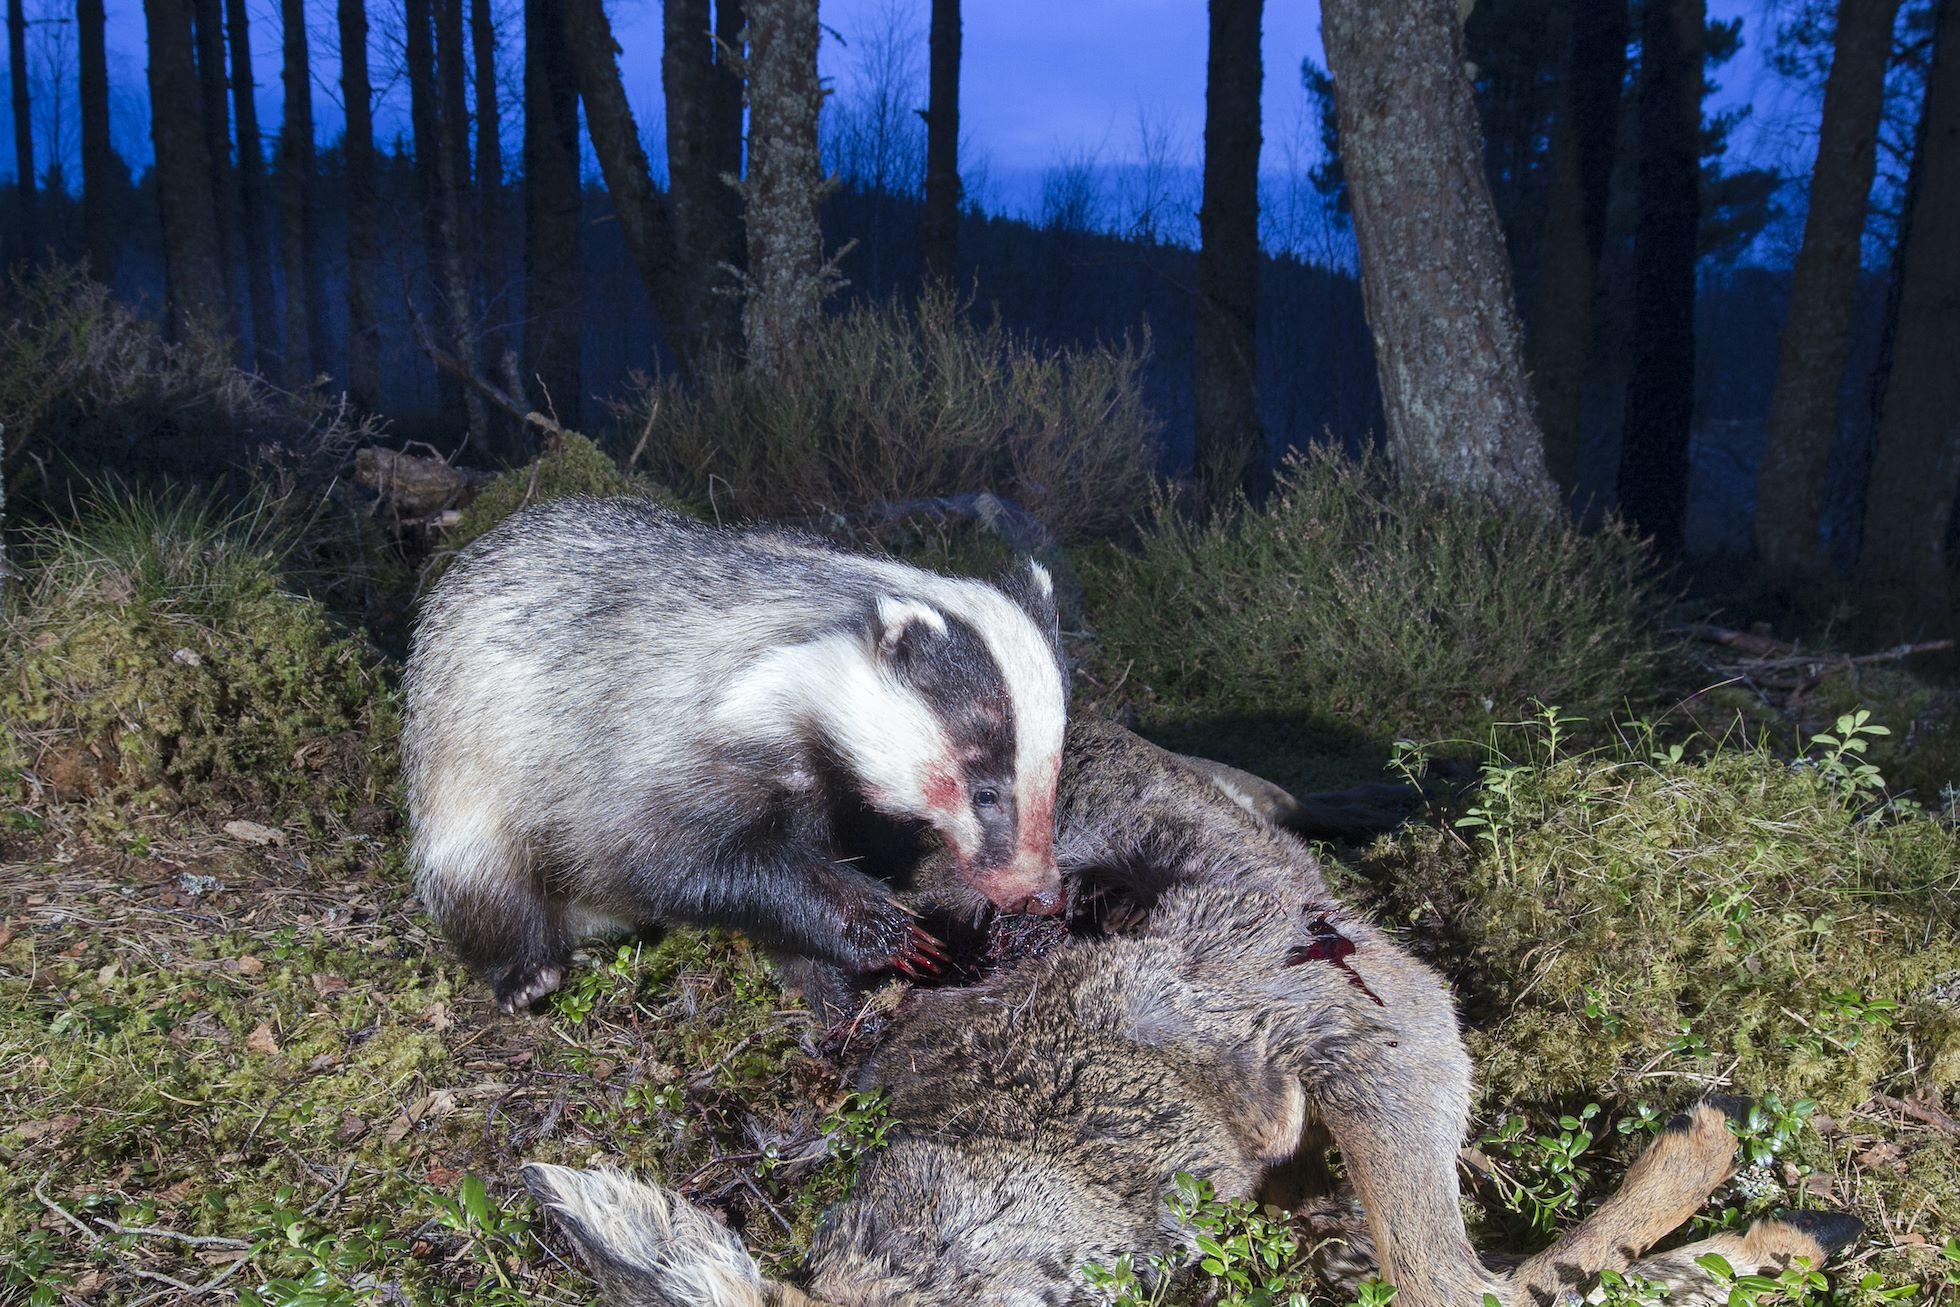 Badger (Meles meles) scavenging on a roe deer carcass, Cairngorms National Park, Scotland